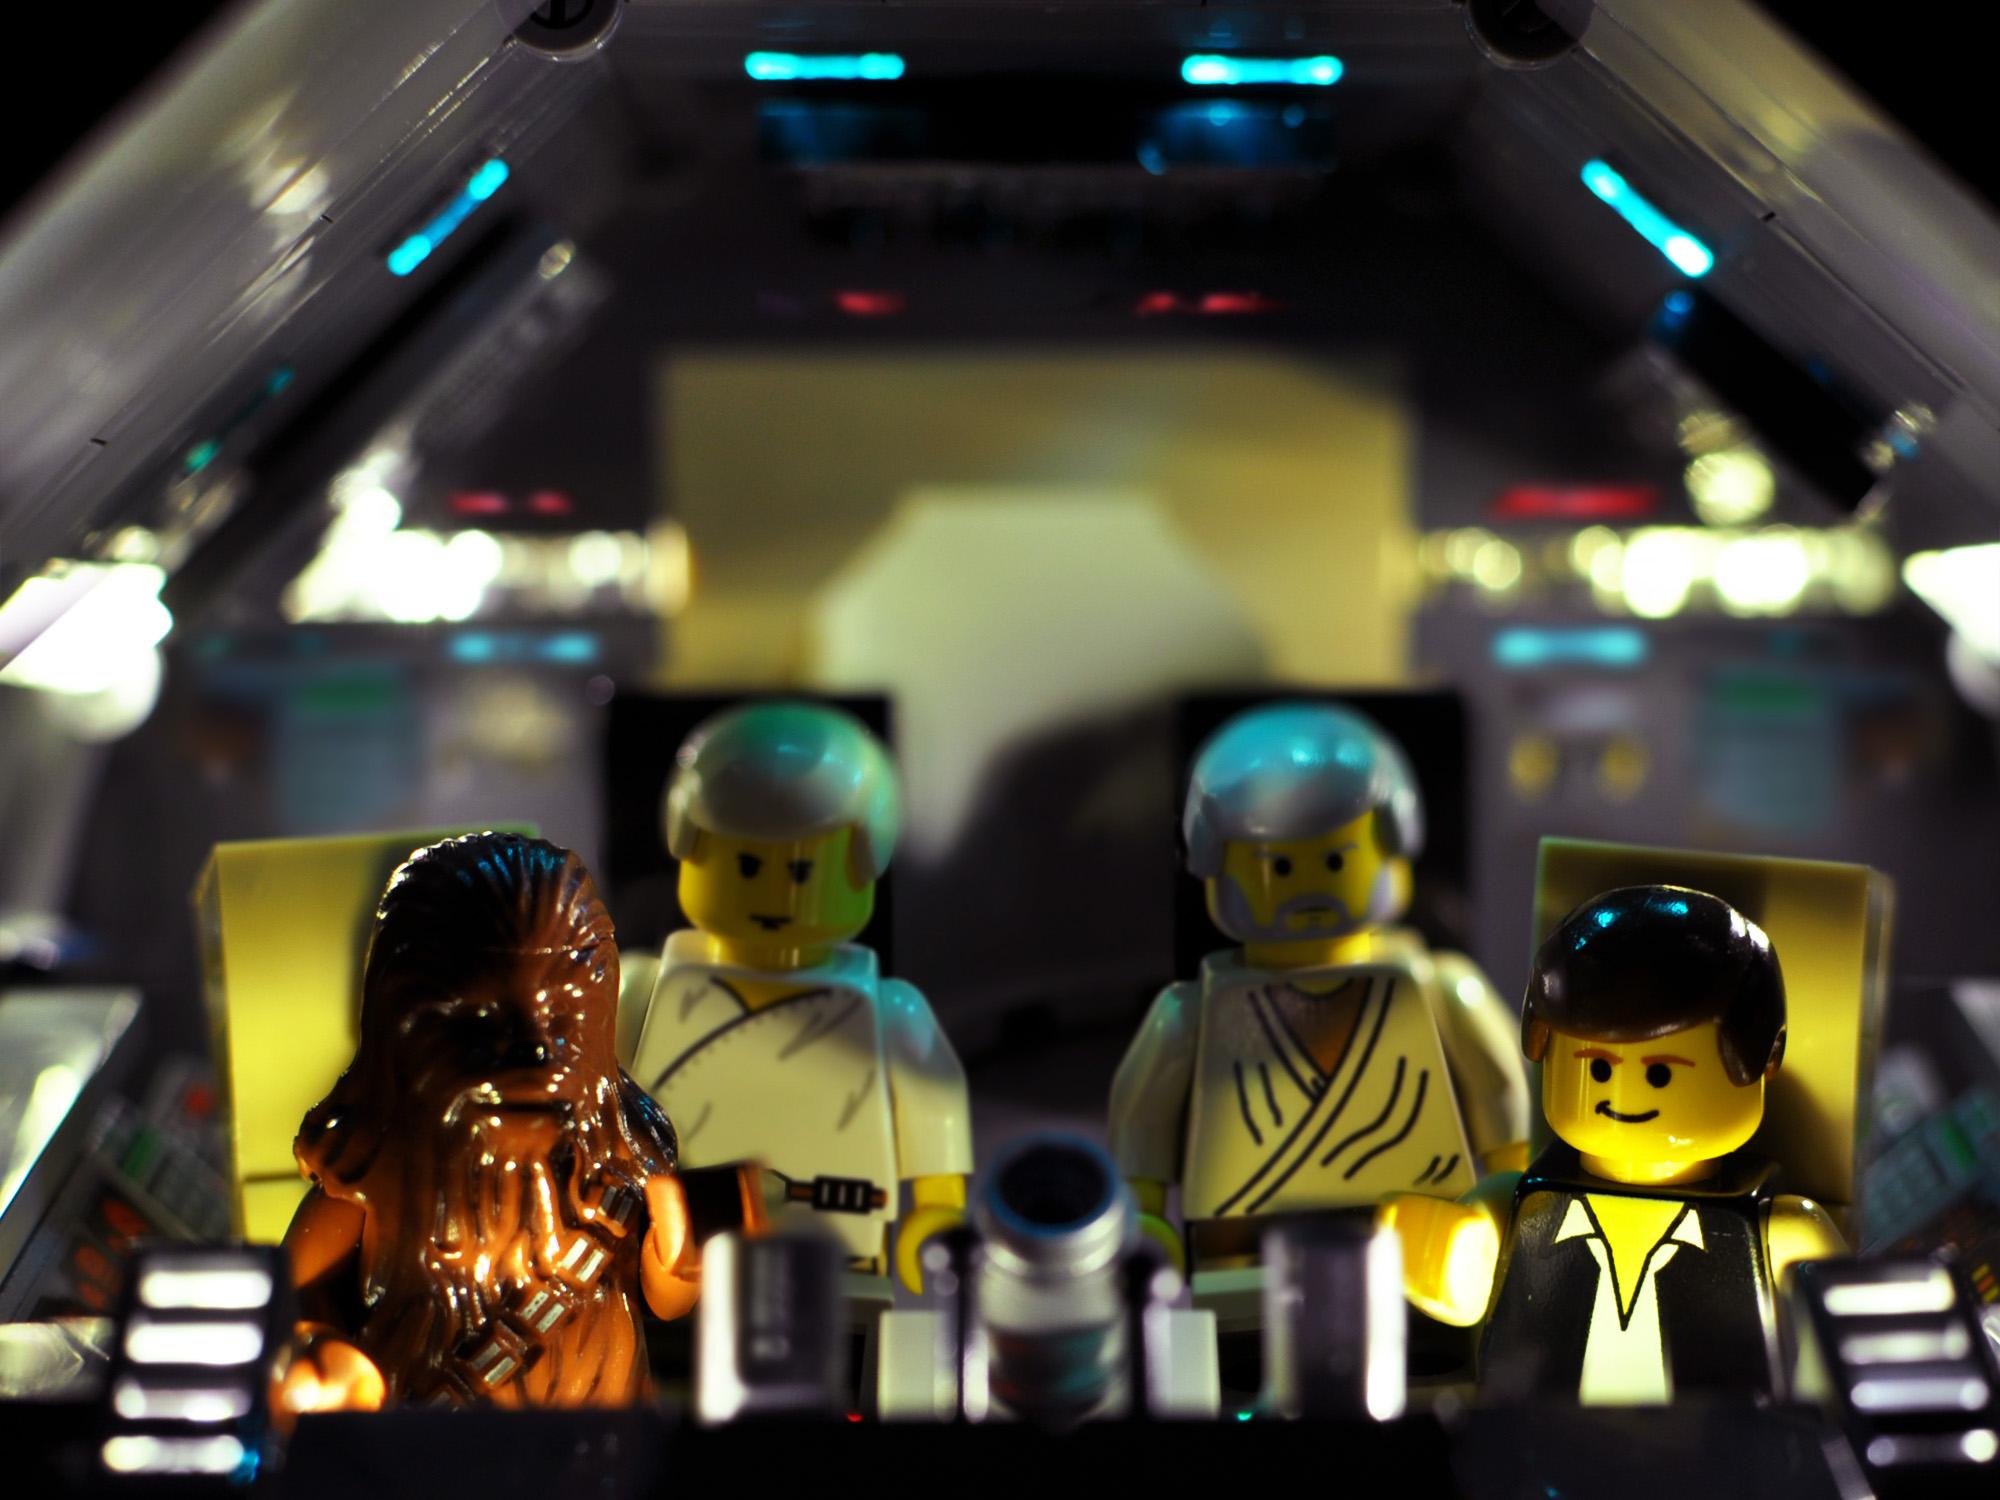 Star Wars in Lego: 2000-2001